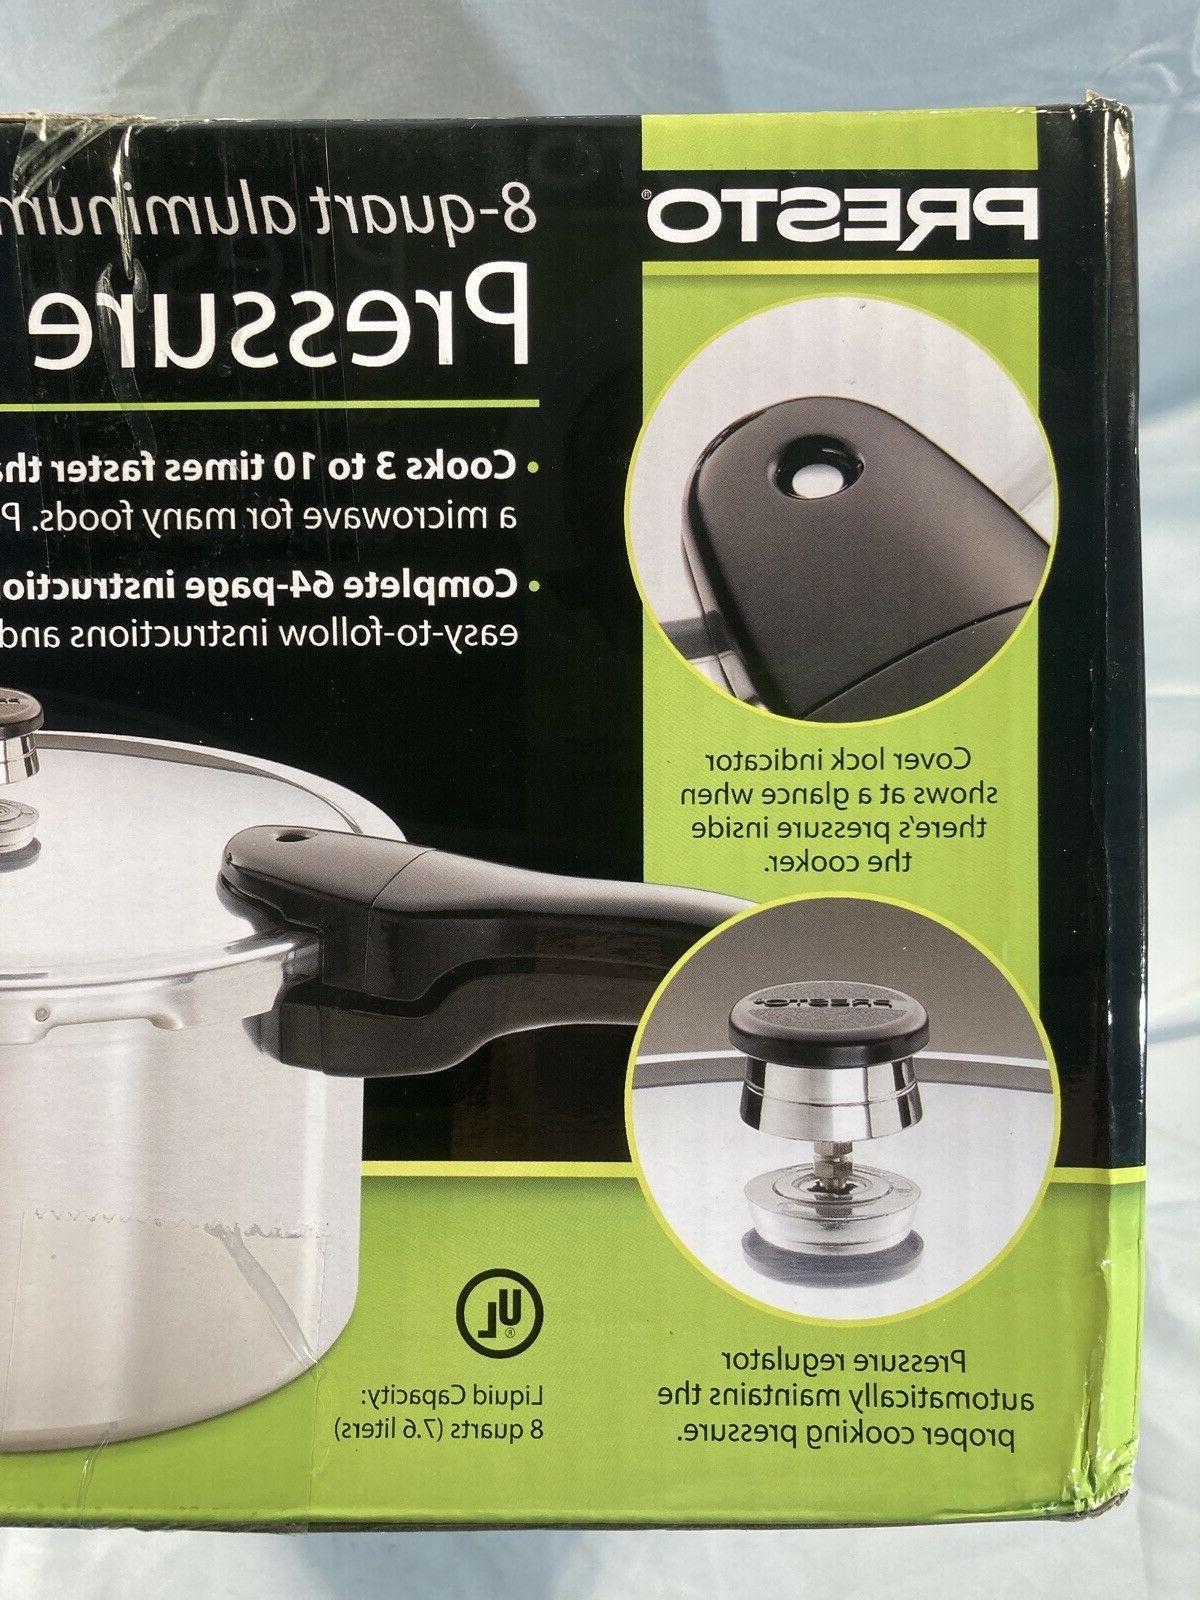 Presto Quart Pressure Cooker. Gas, Electric and Top.